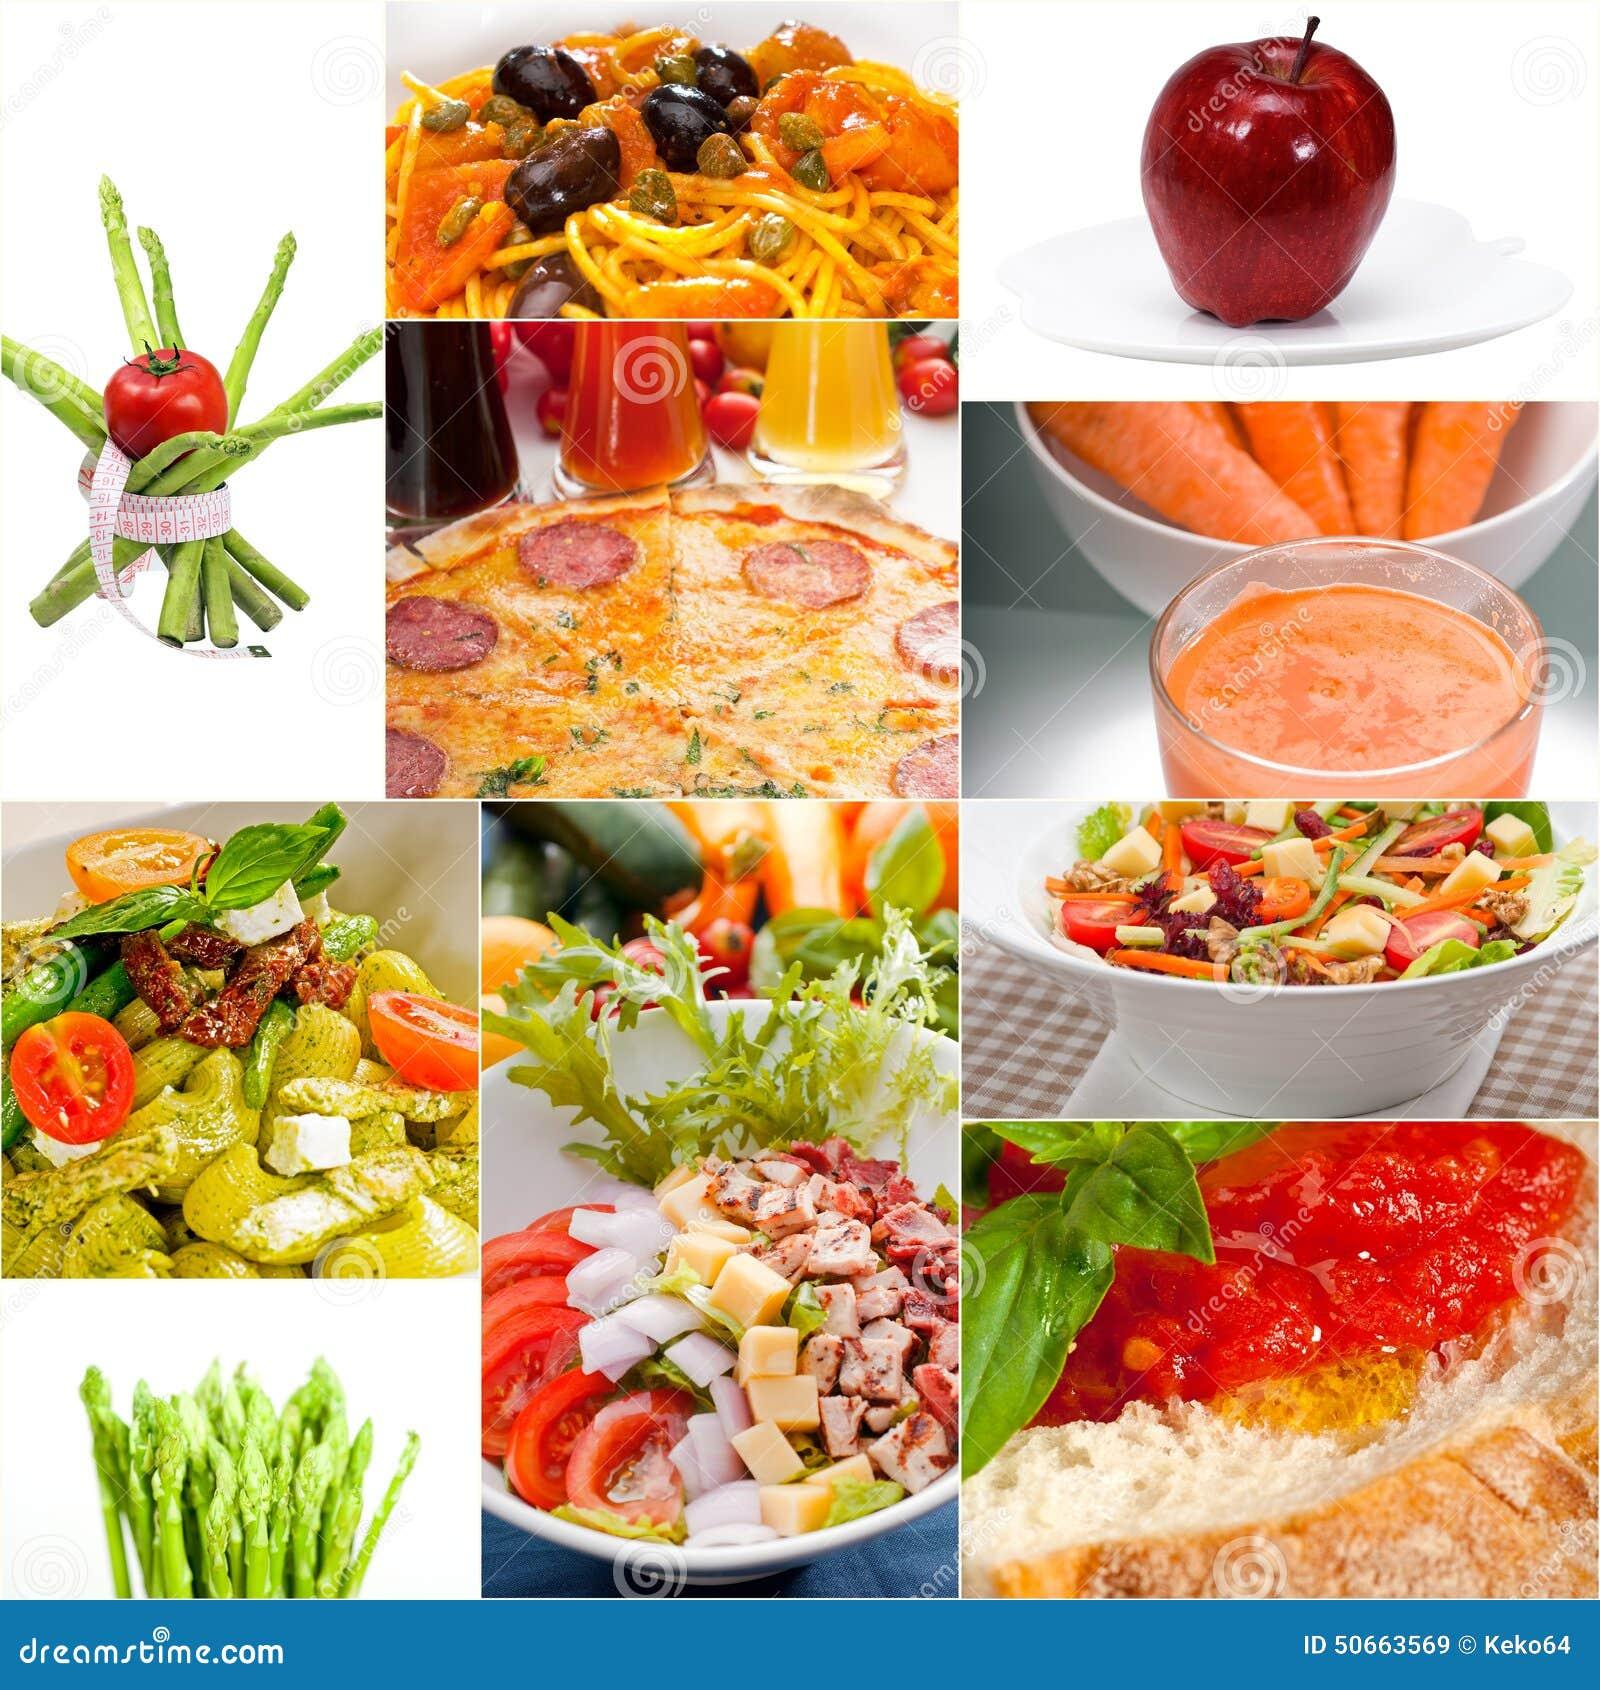 Healthy vegetarian vegan food collage stock photo image for Cuisine vegan